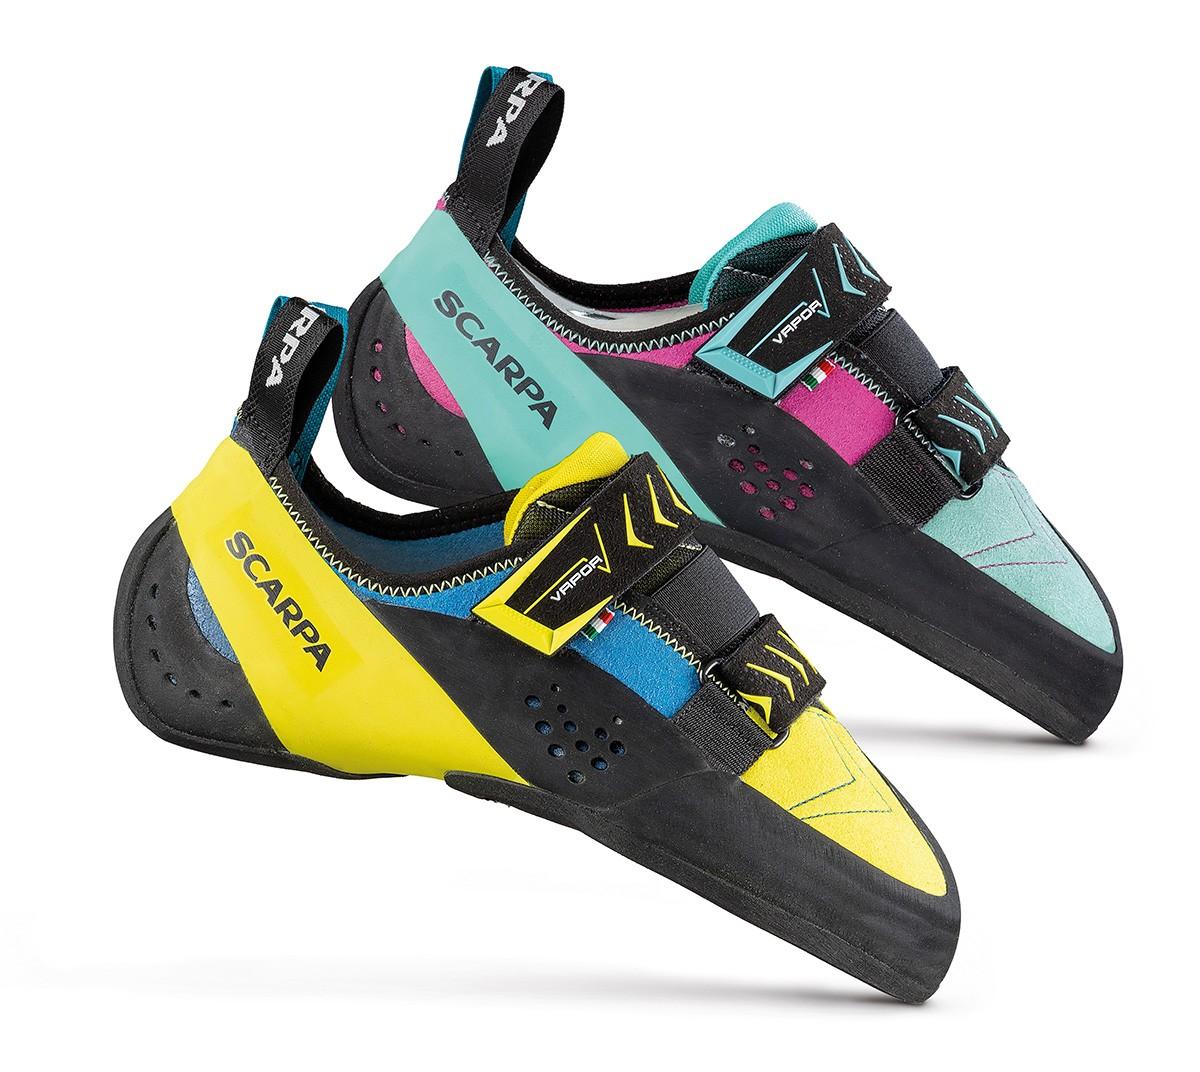 SCARPA Vapor V Rock Climbing Shoe Review